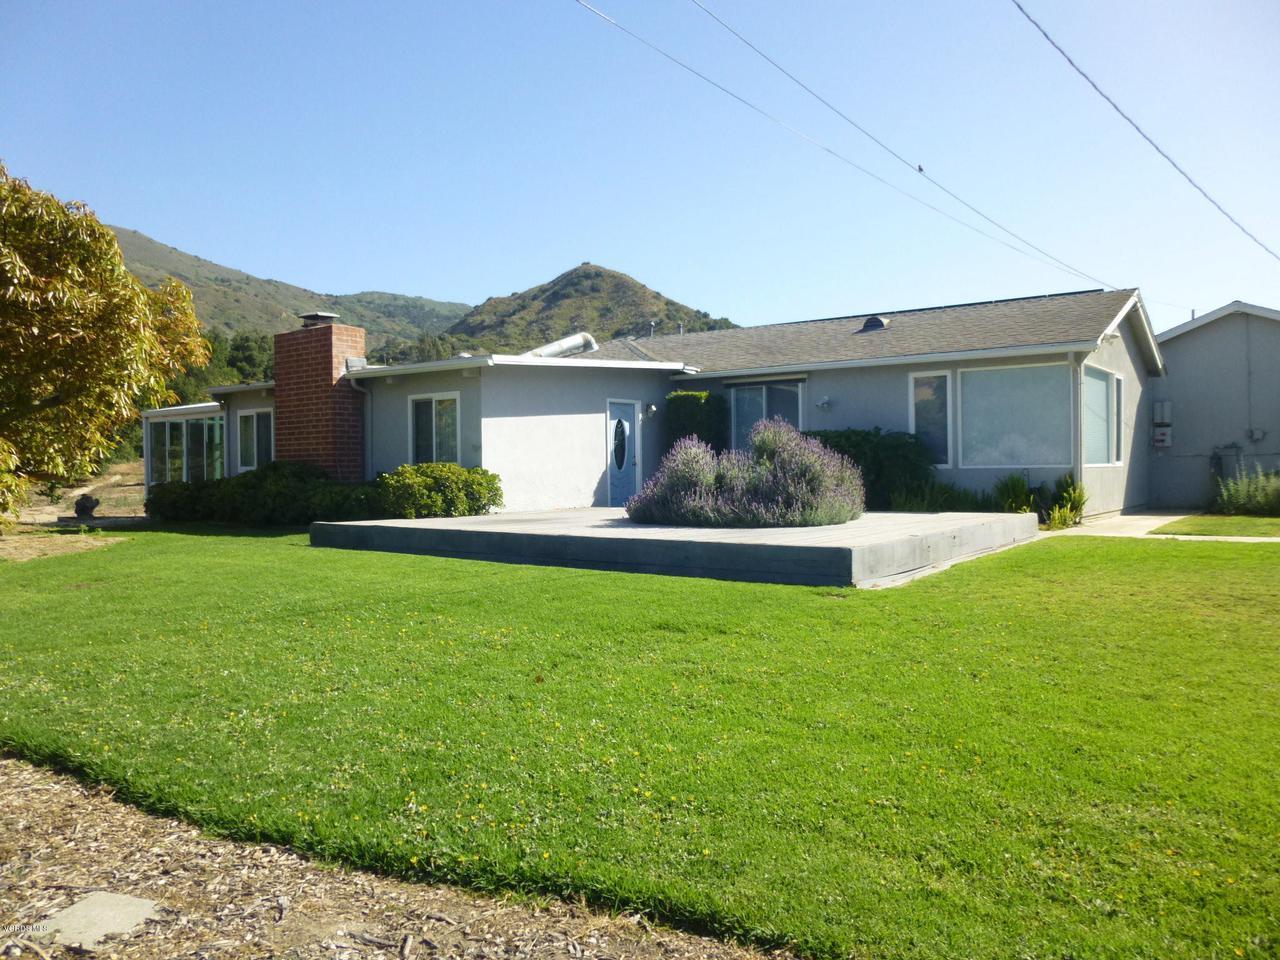 17896 SOUTH MOUNTAIN, Santa Paula, CA 93060 - P1000912